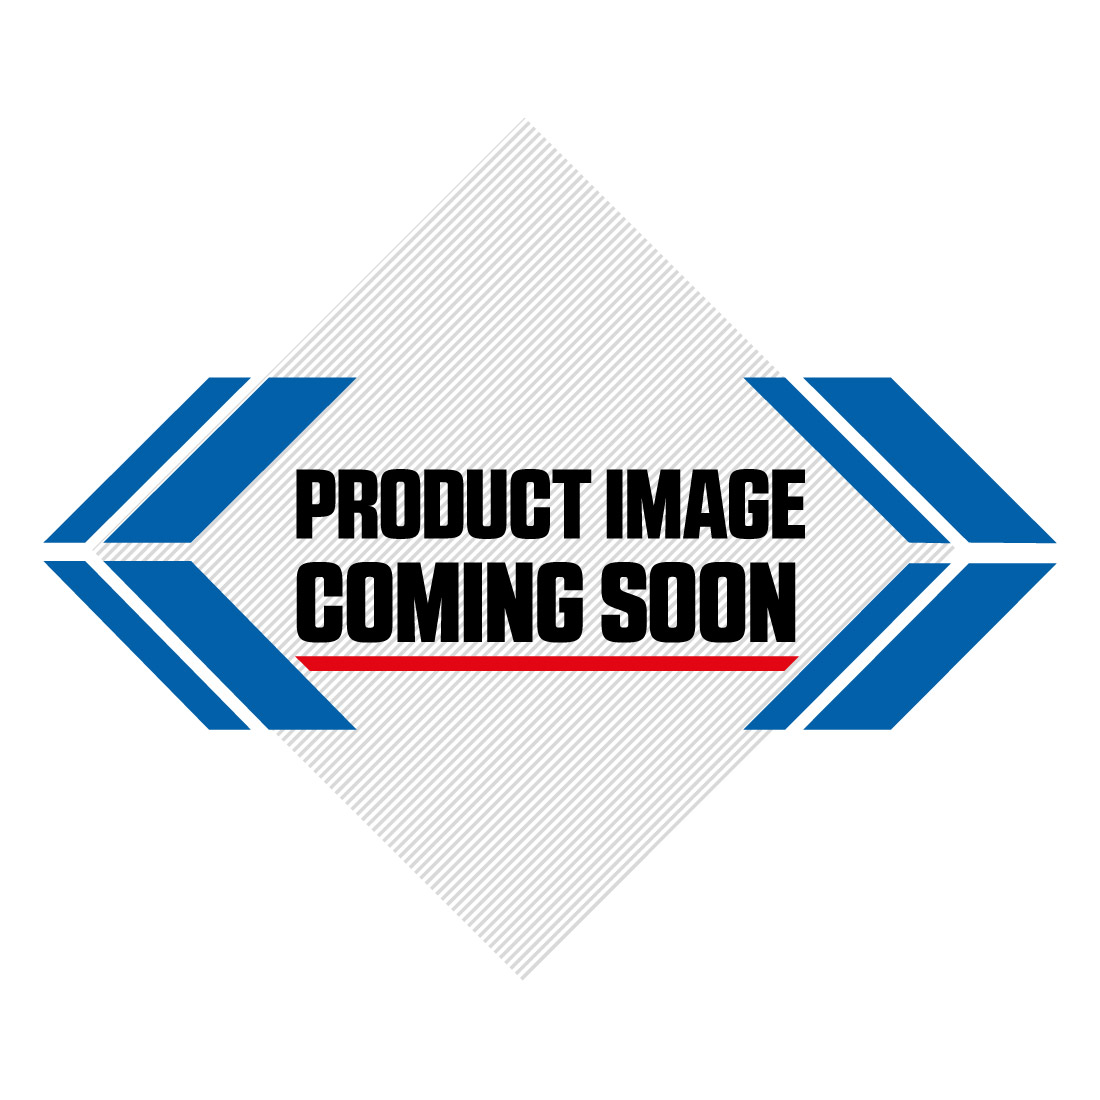 Suzuki Plastic Kit Suzuki RMZ 450 (08-17) White Image-1>